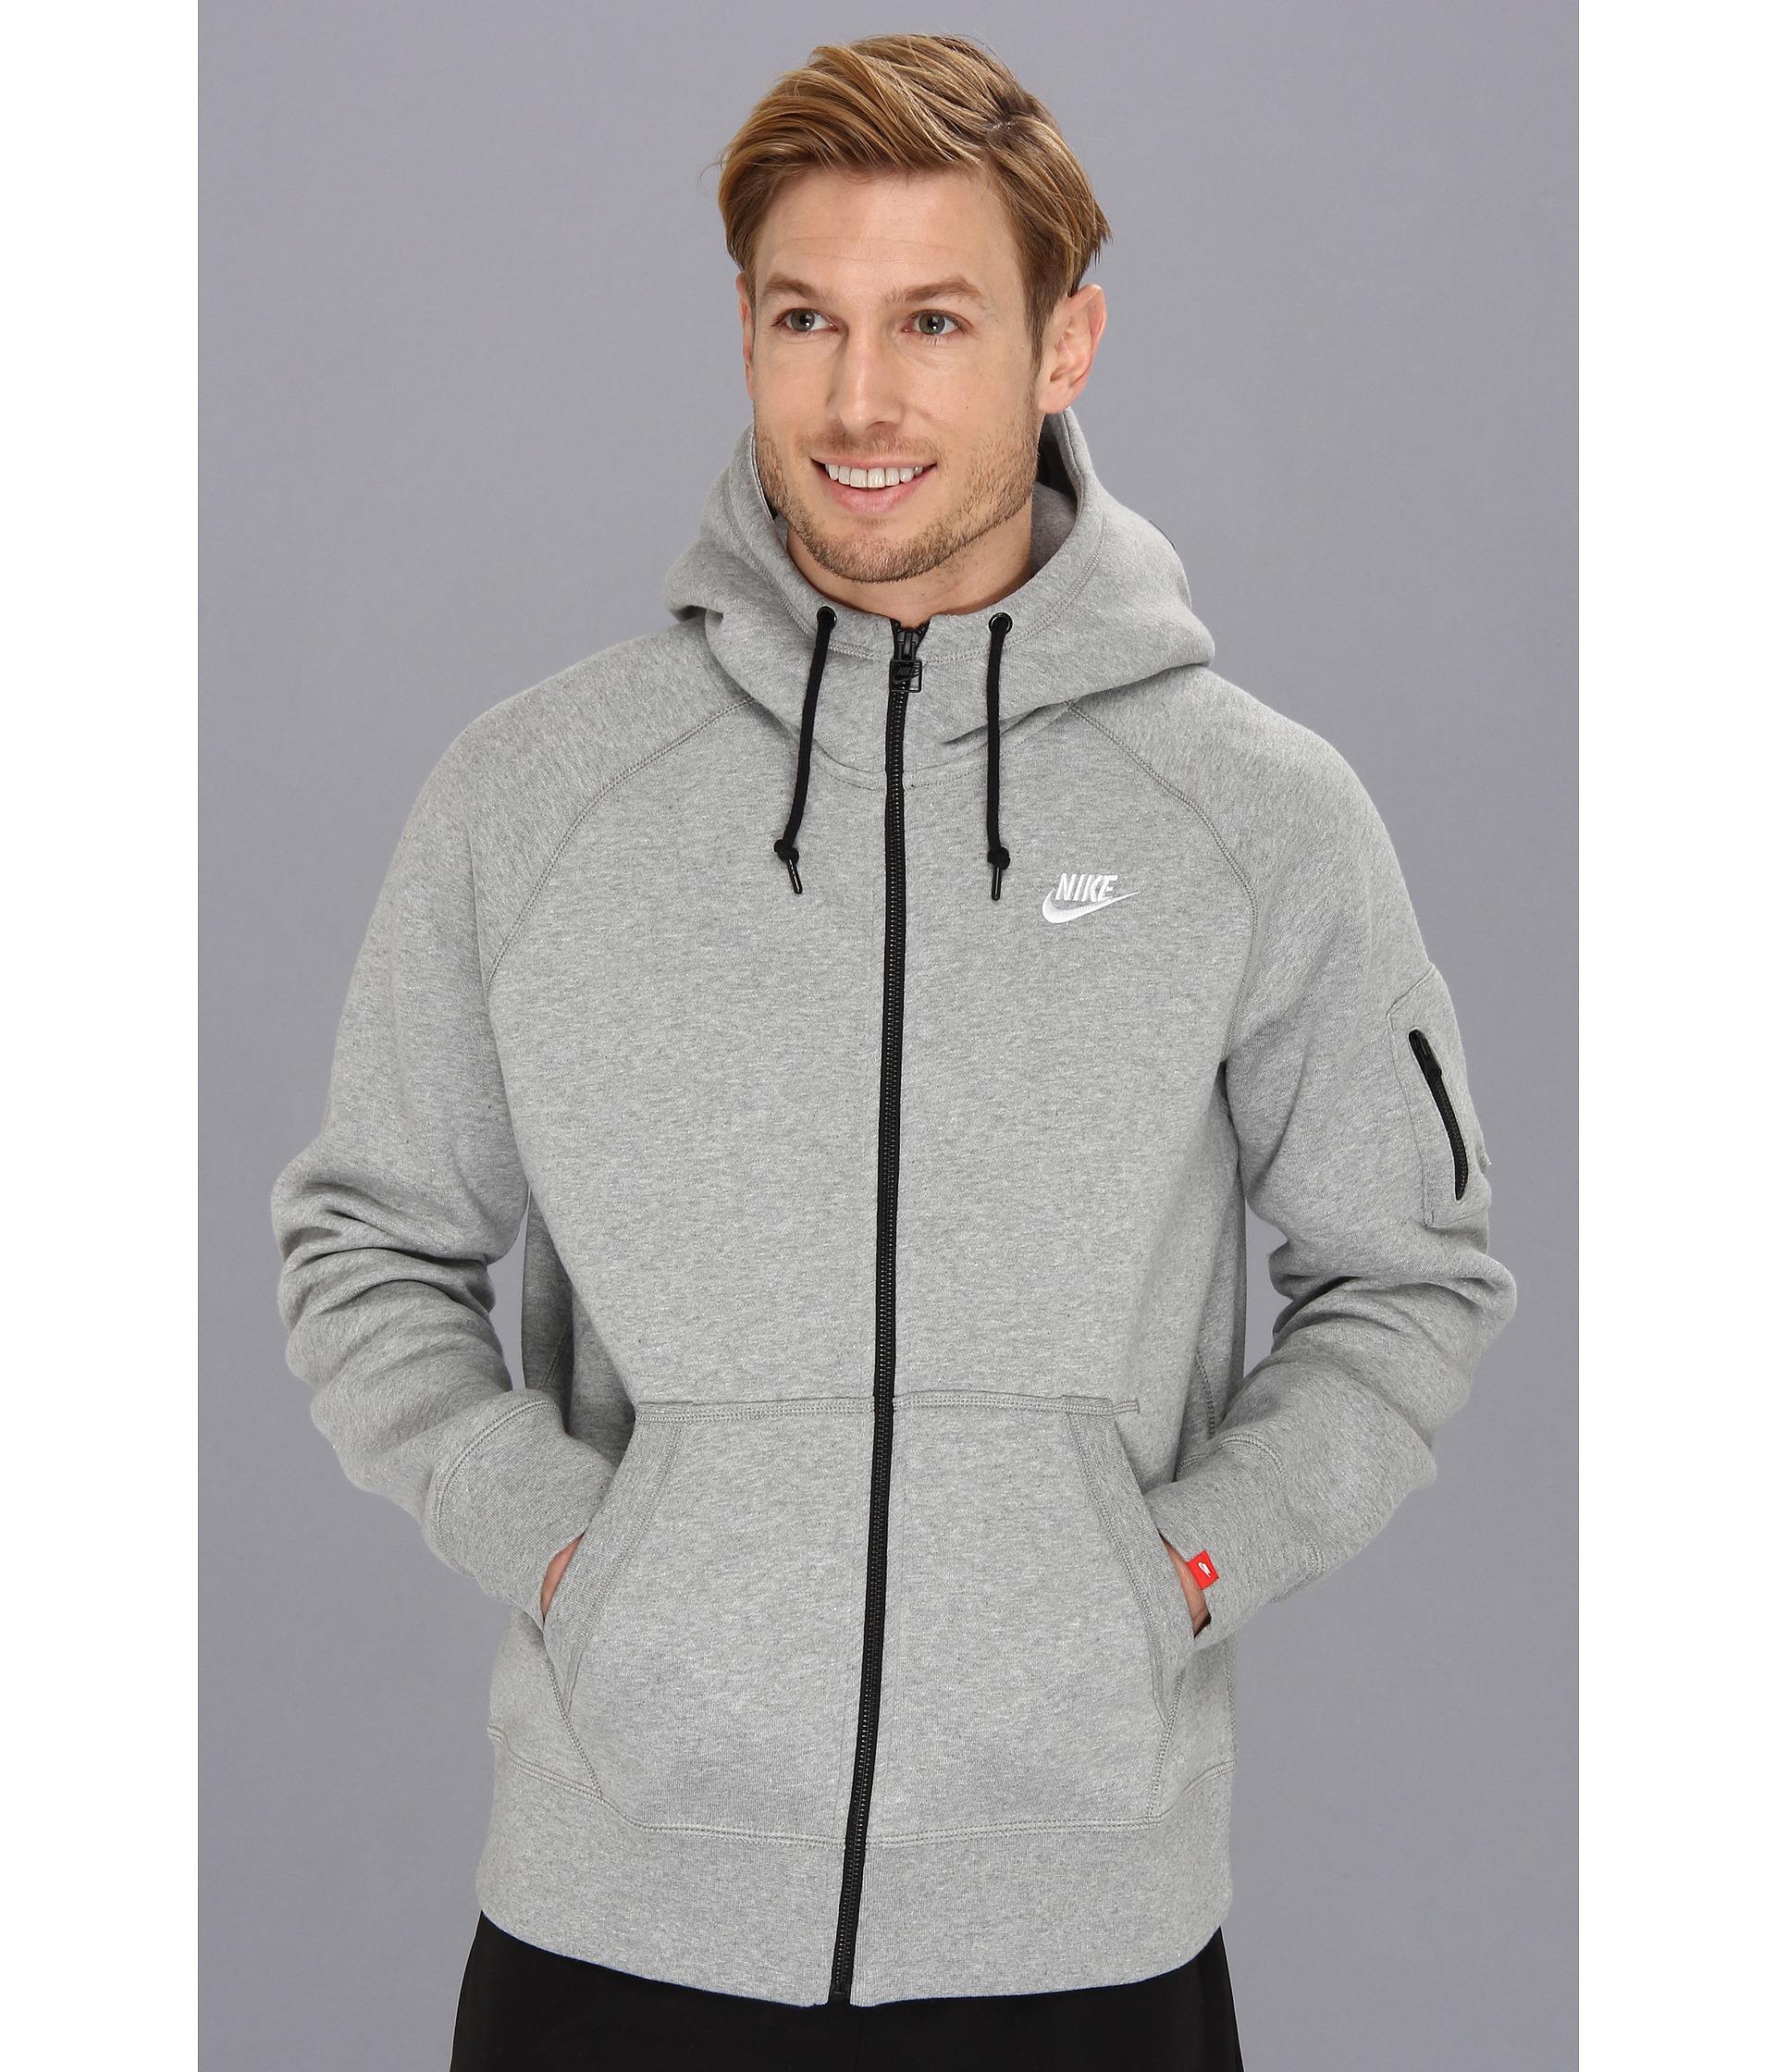 Nike Aw77 Fleece Fz Hoodie in Gray for Men (Dark Grey Heather/White)   Lyst